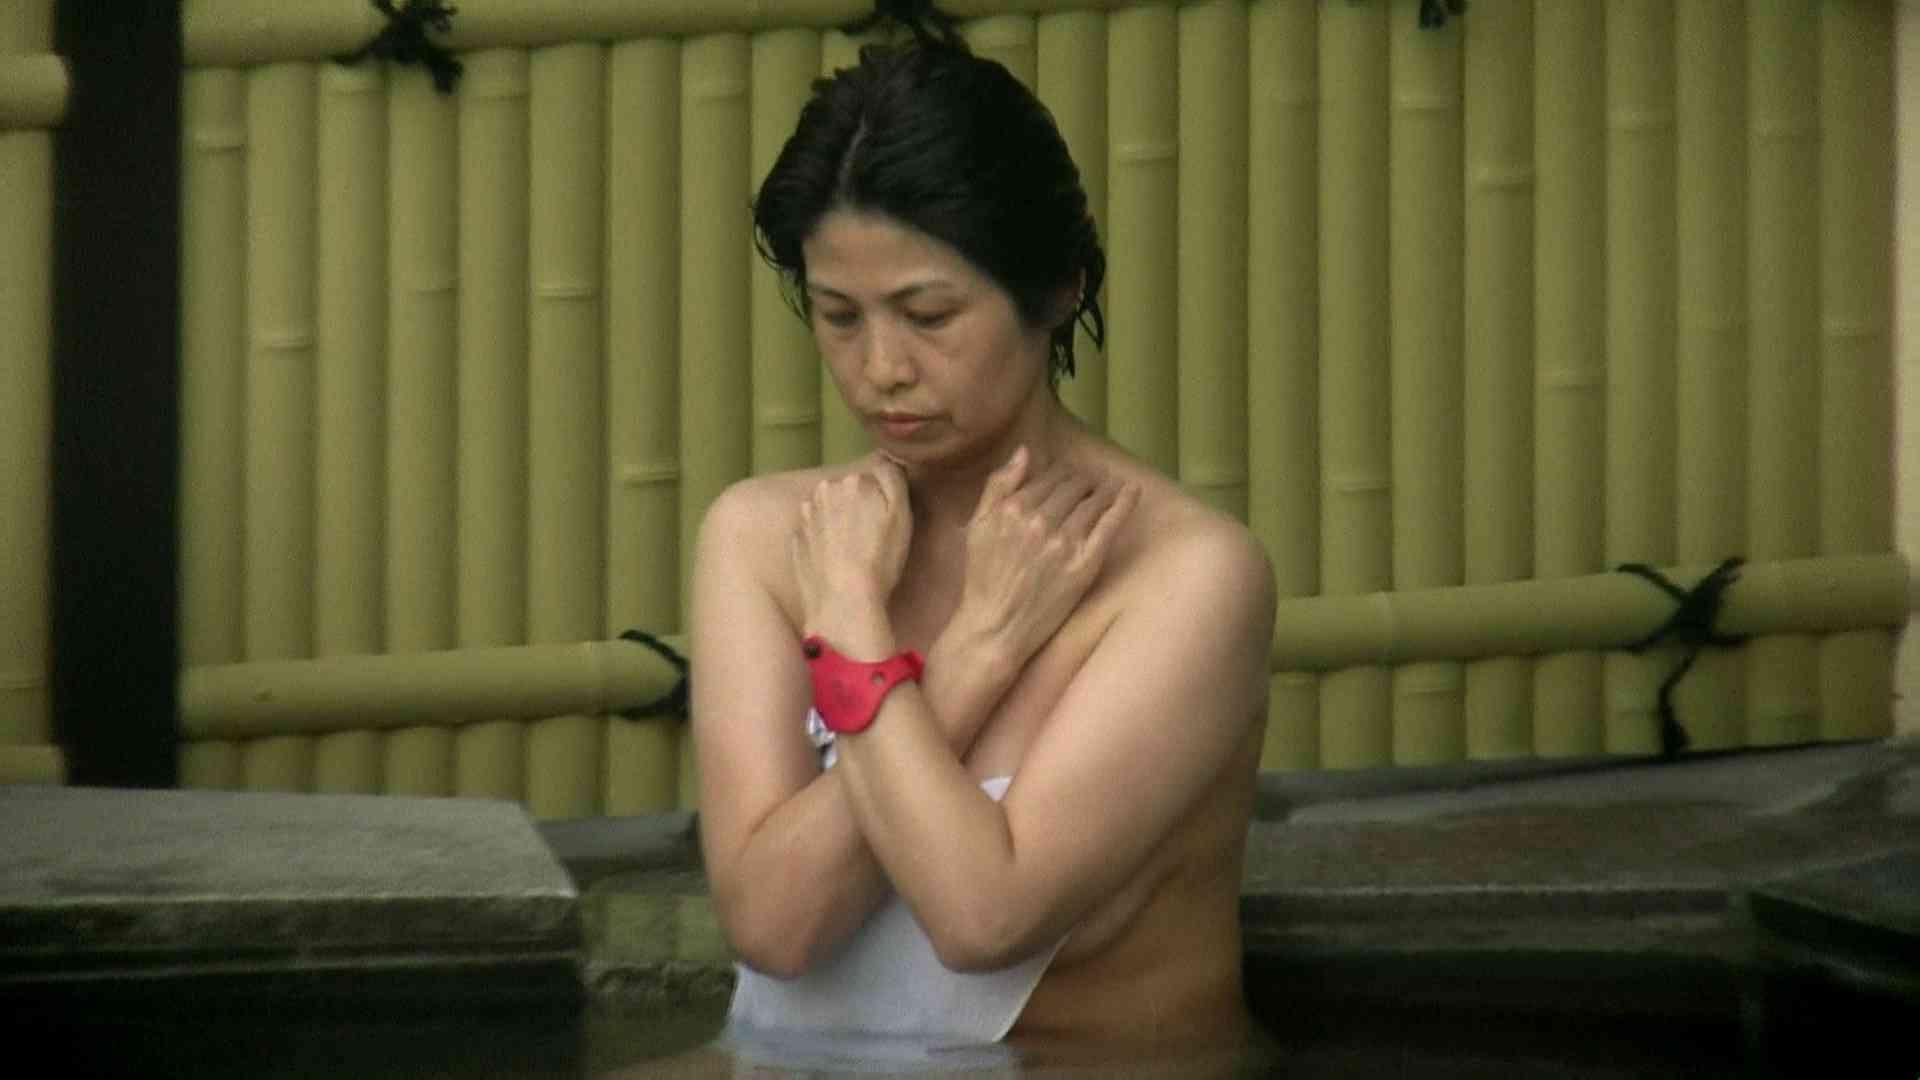 Aquaな露天風呂Vol.636 OL女体 | 露天  87連発 40